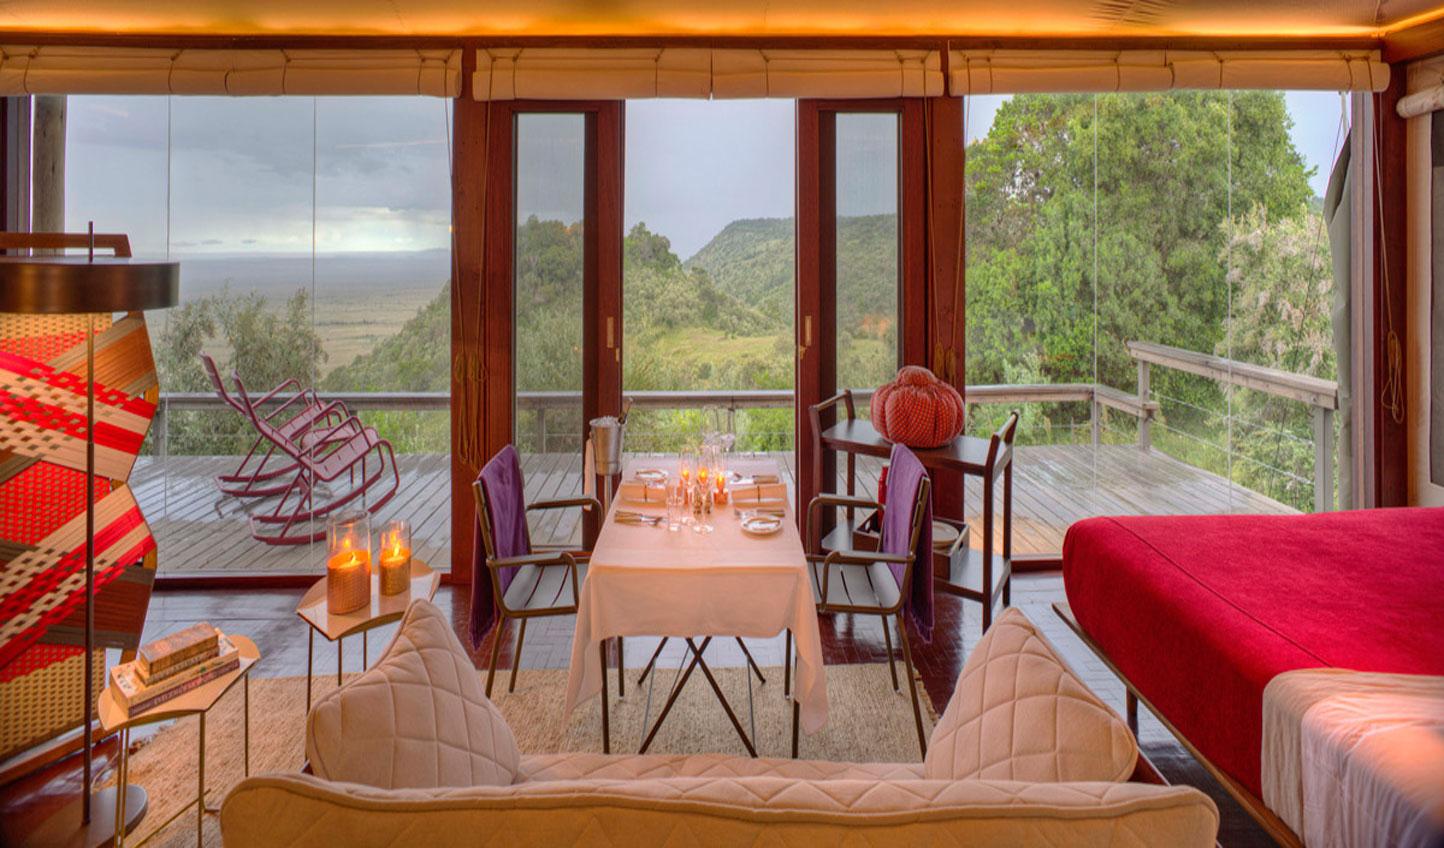 Lavish interiors of the Angama Mara